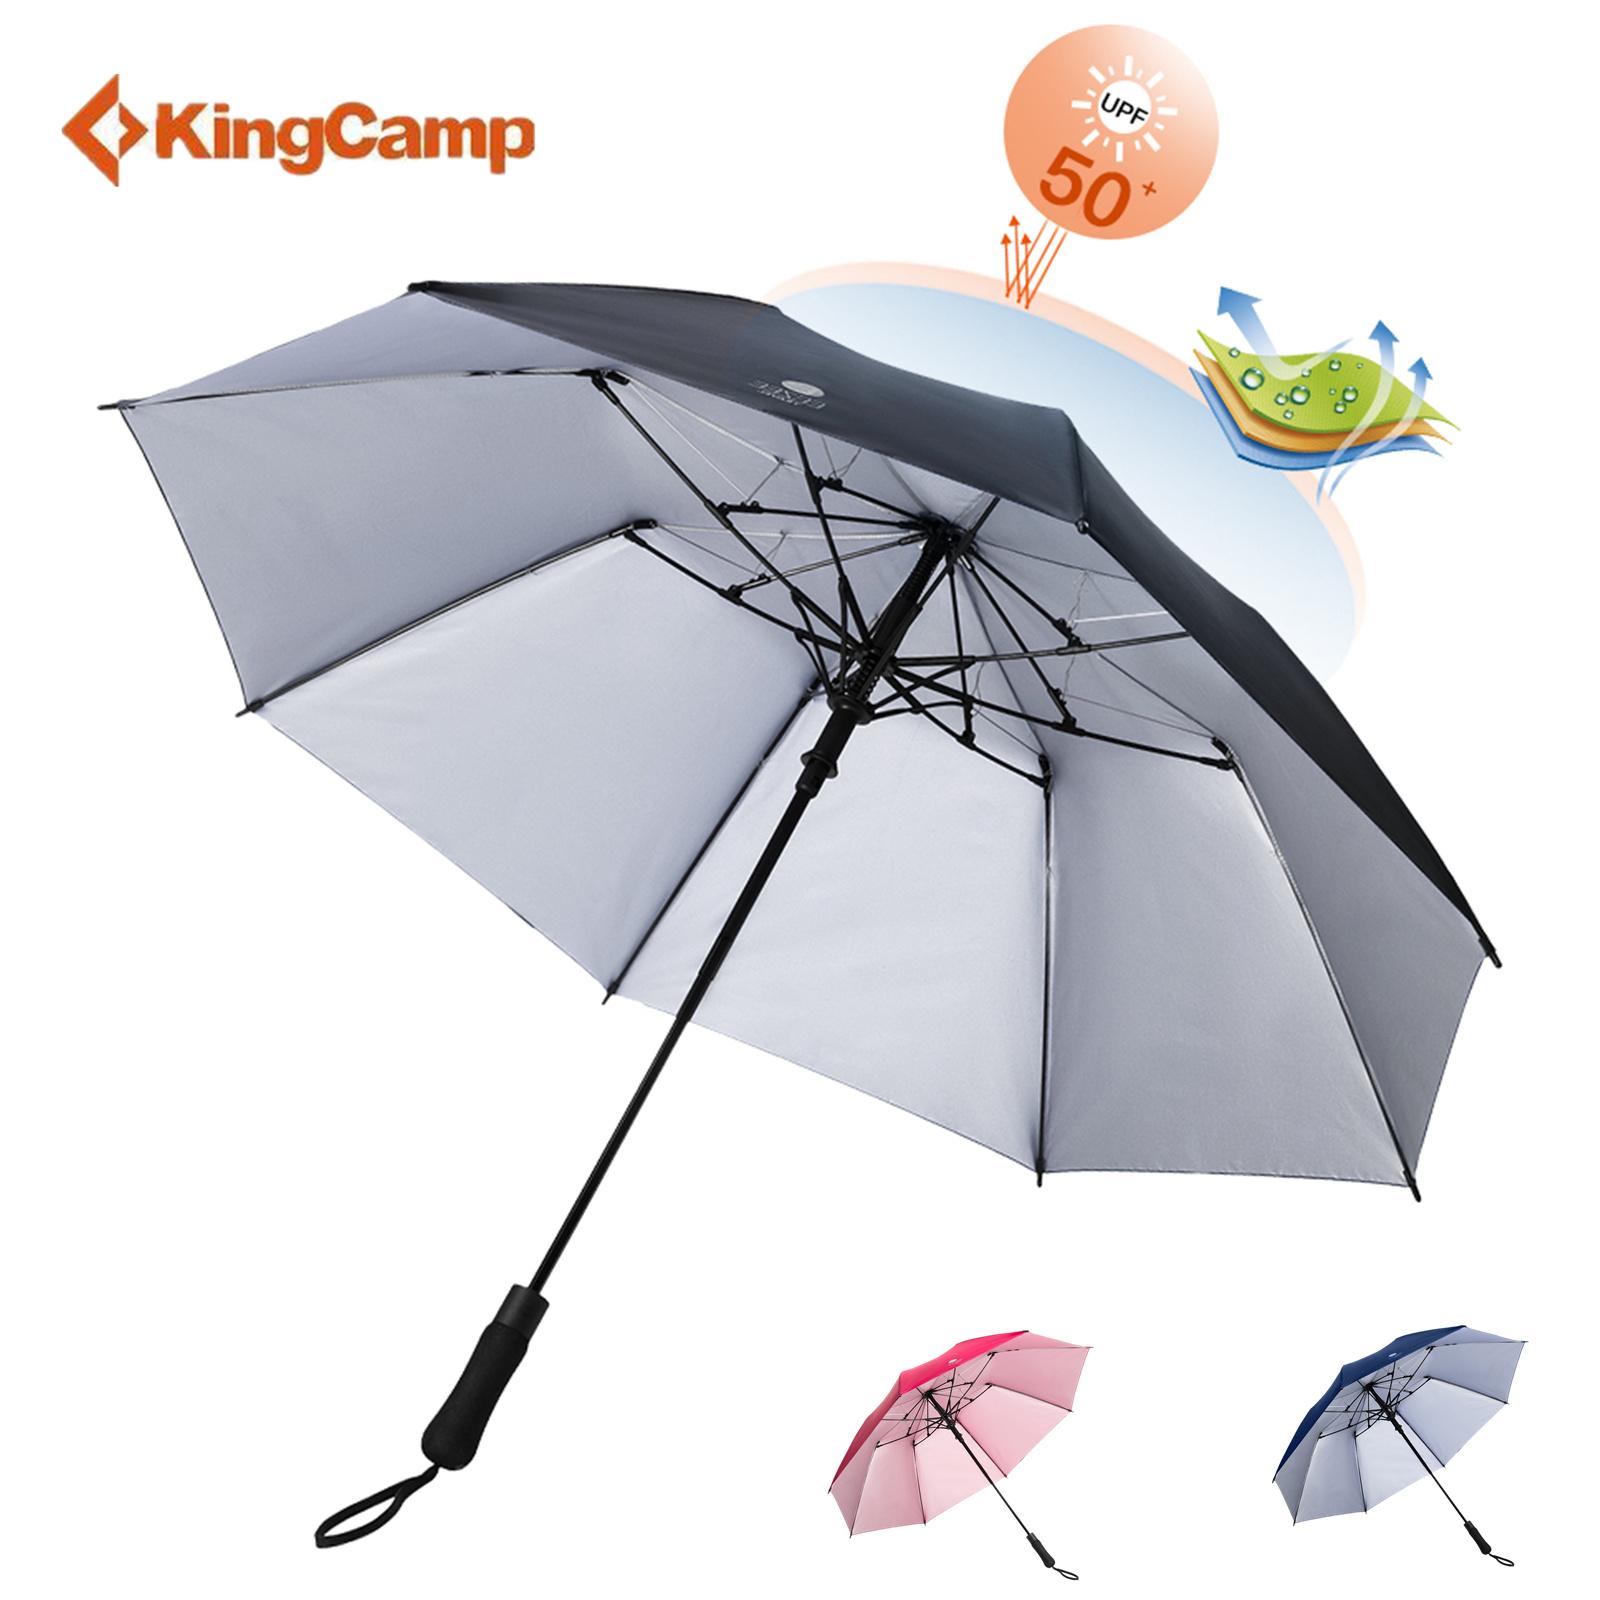 UV Protection Sunshade Compact 5 Folding  Pocket Totes Umbrellas Light